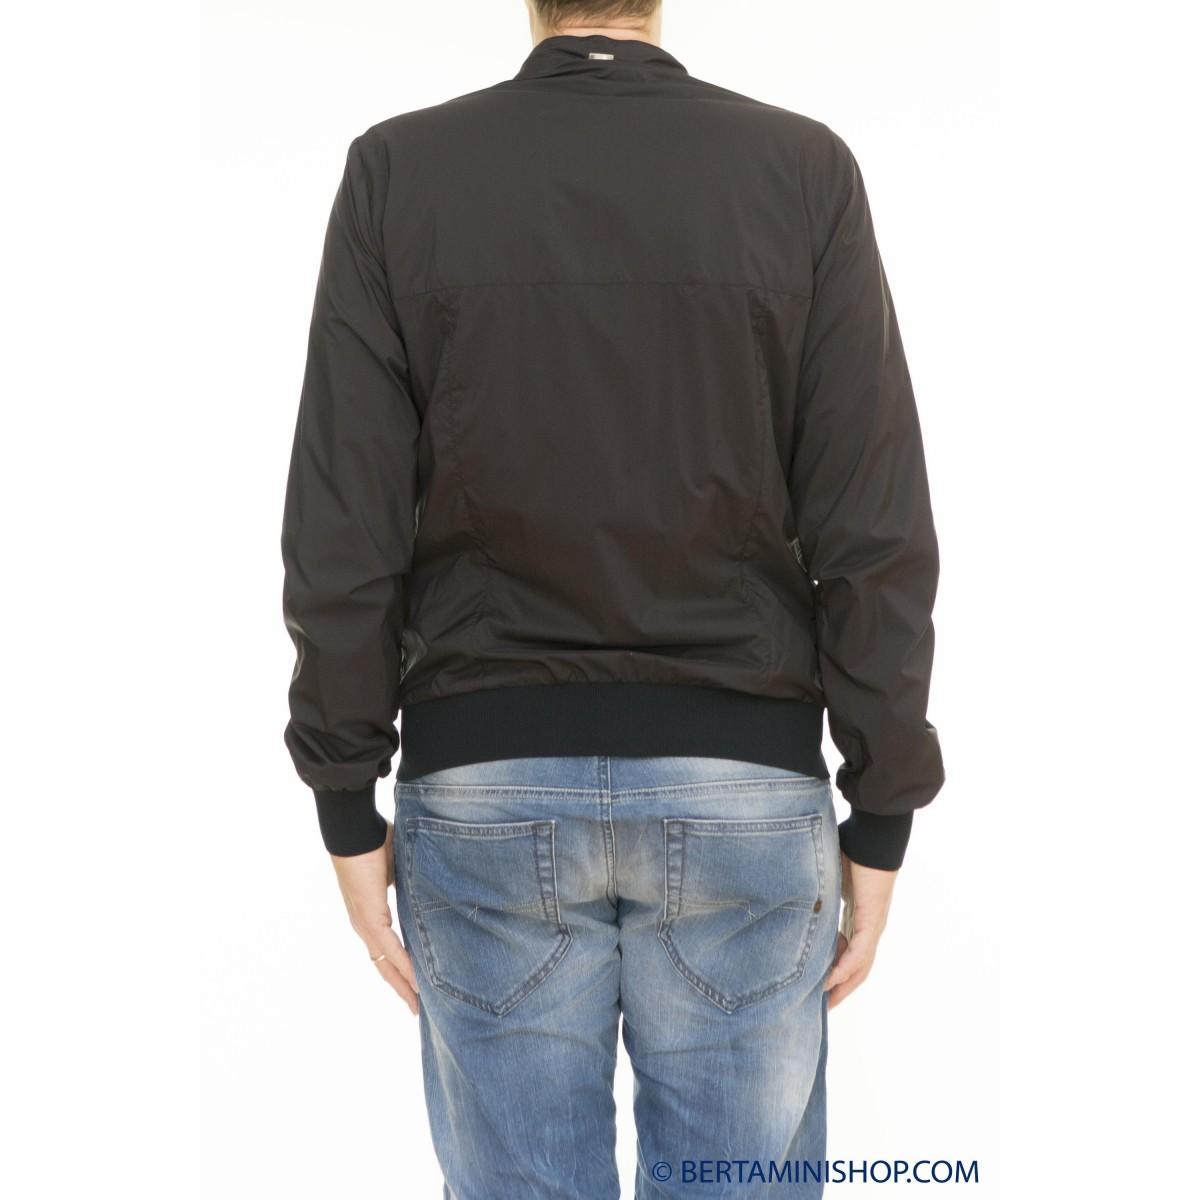 Sports Jacket Herno Man - GI0062U 19288 9200 - blu navy